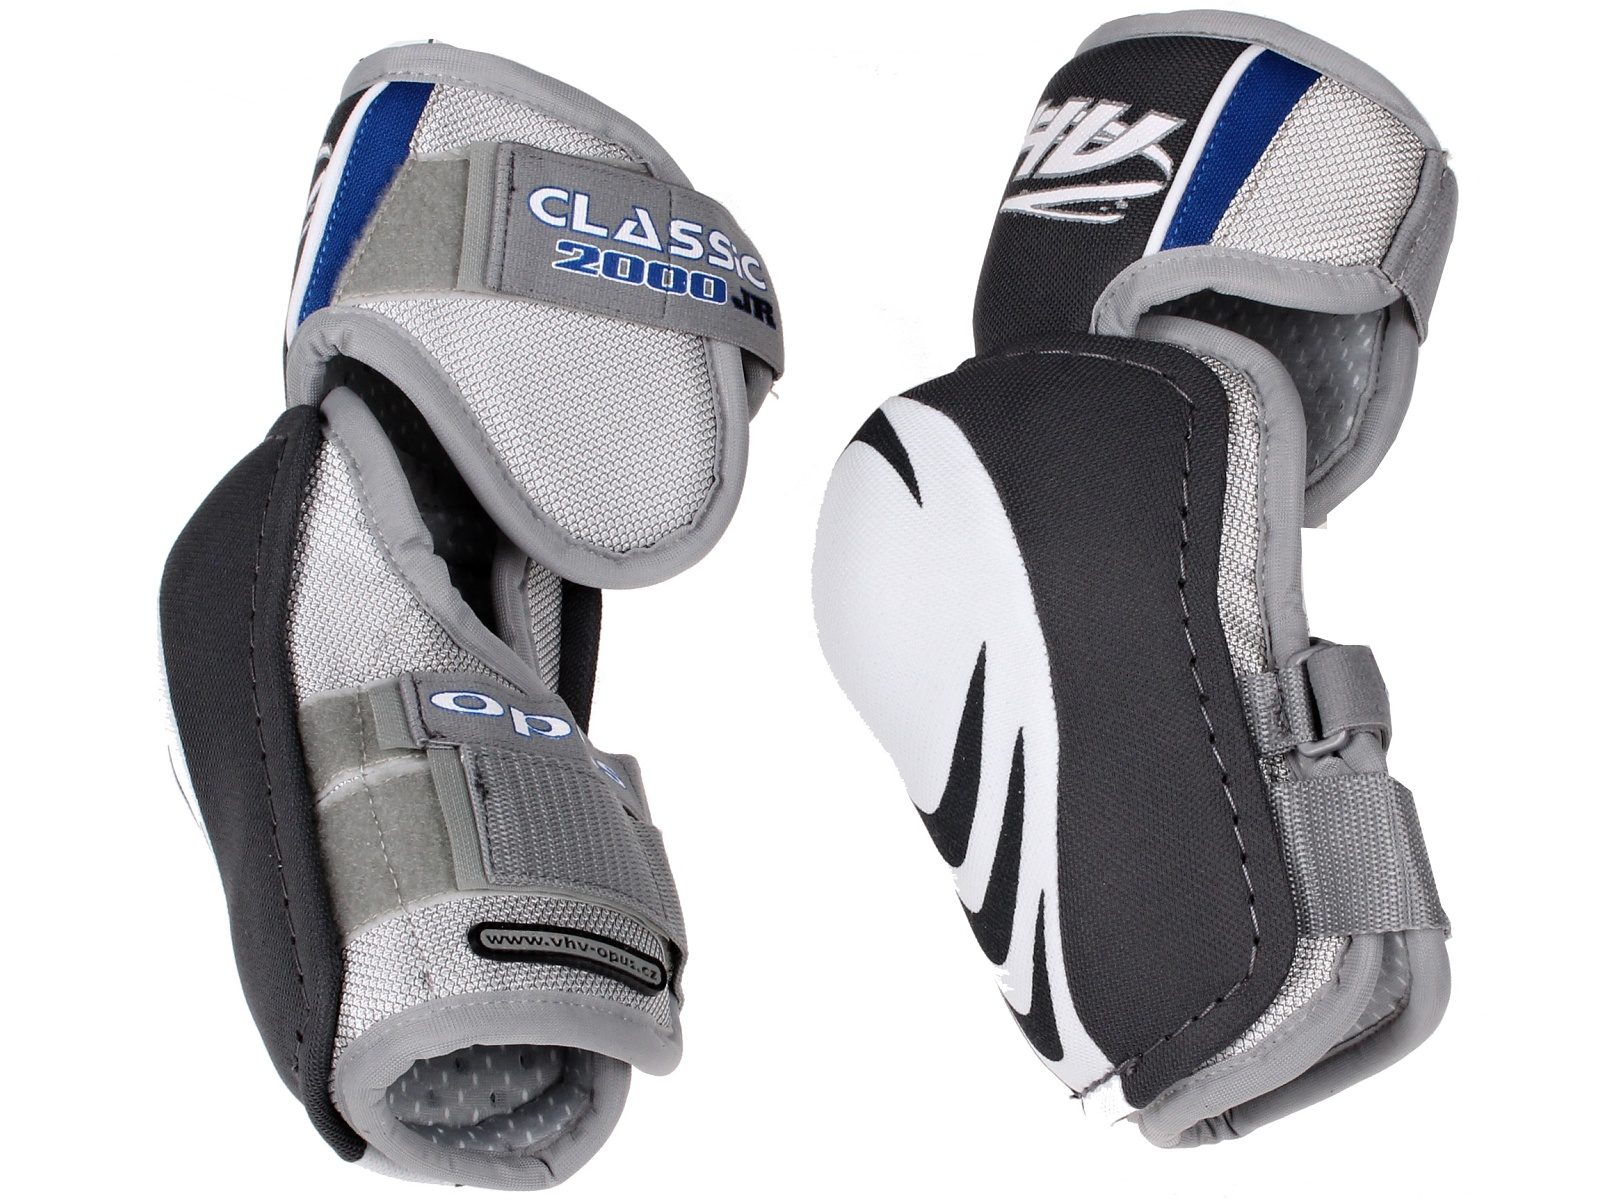 Hokejový chránič loktů OPUS 3842 Classic 2000 JR - vel. S-M